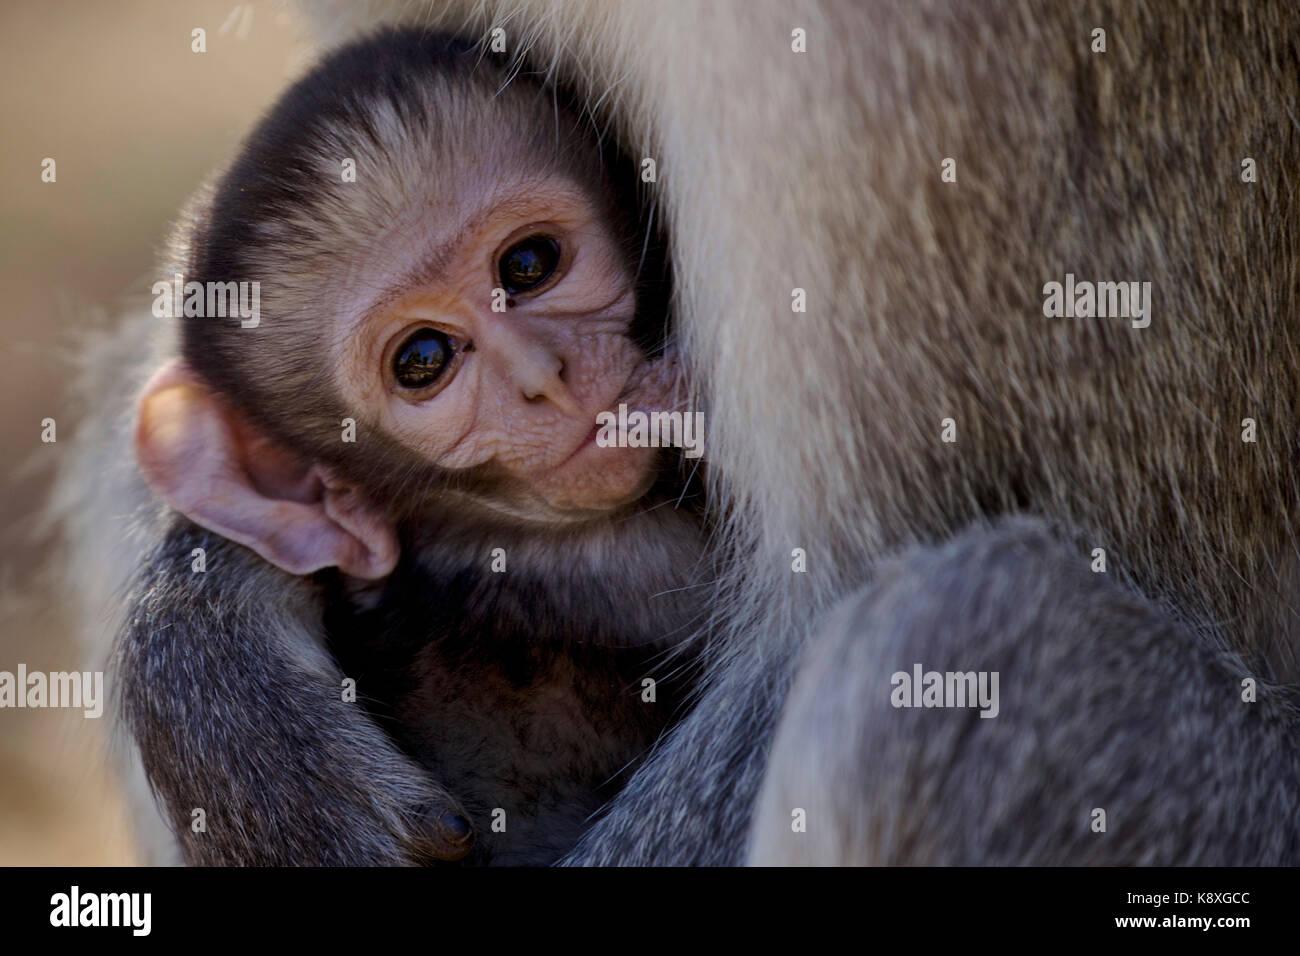 Breakfast Time for a baby Vervet Monkey (Africa) - Stock Image